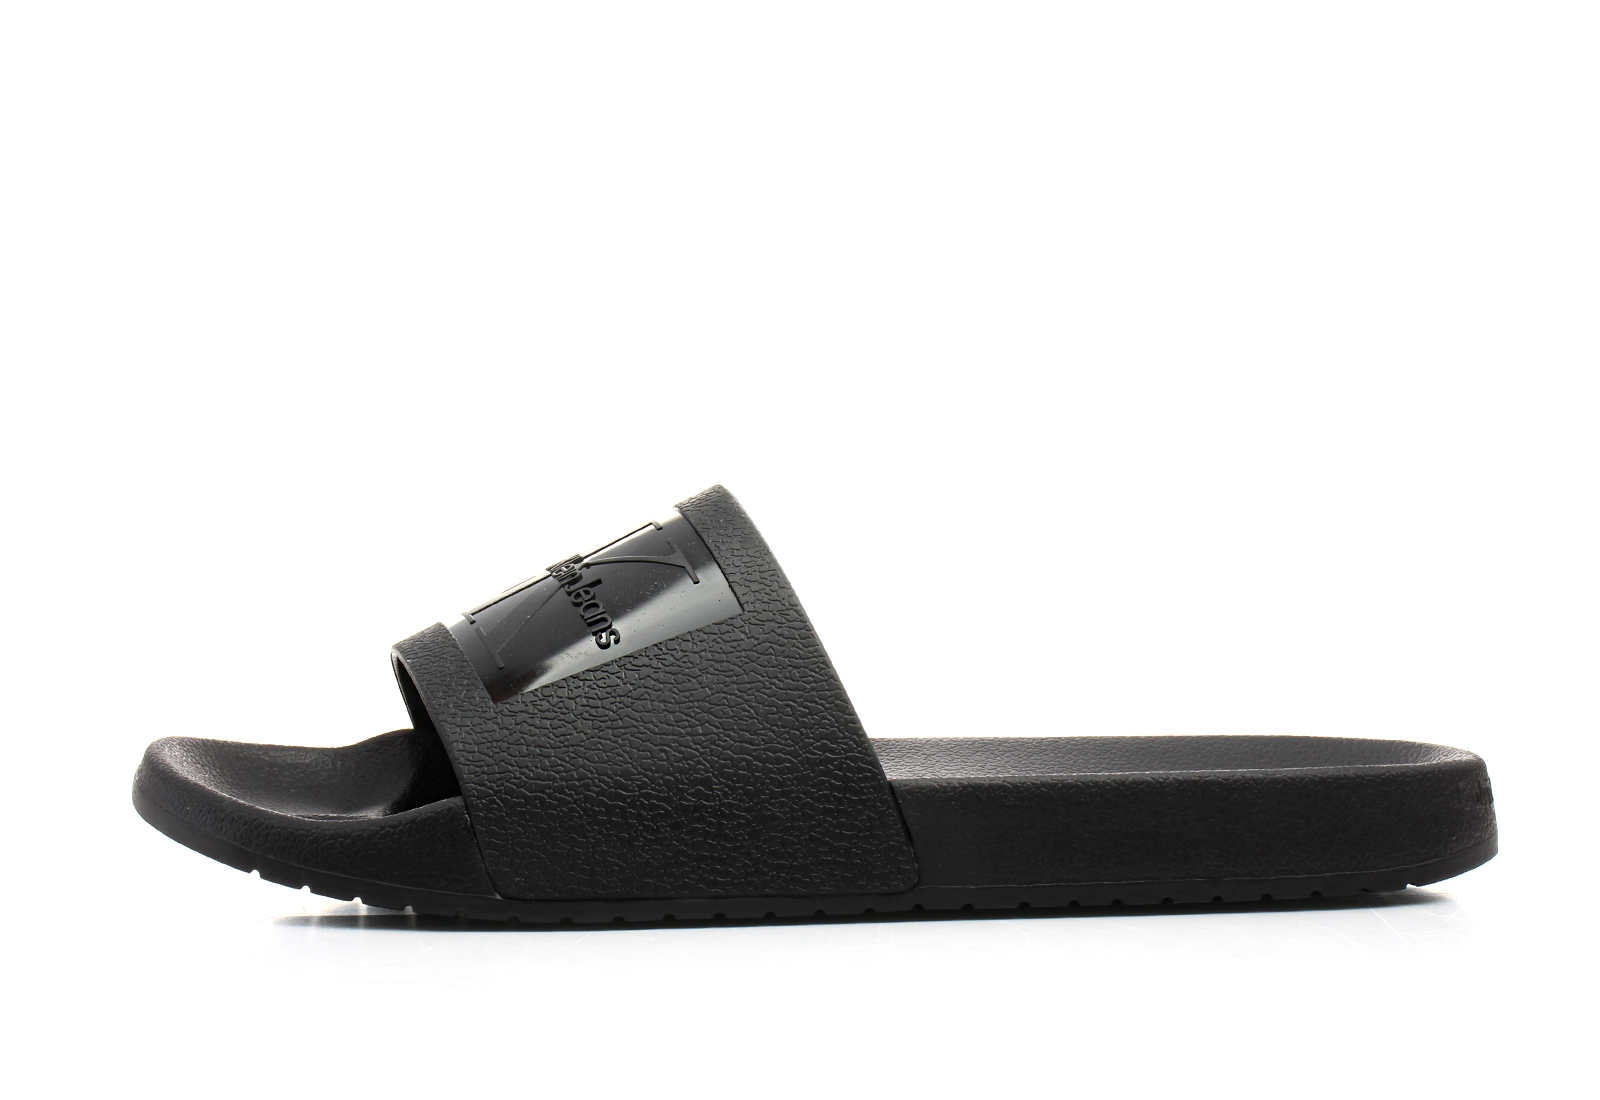 Calvin Klein Jeans Slippers - Vincenzo - S0547-BLK - Online shop for ... 8cc86f36da